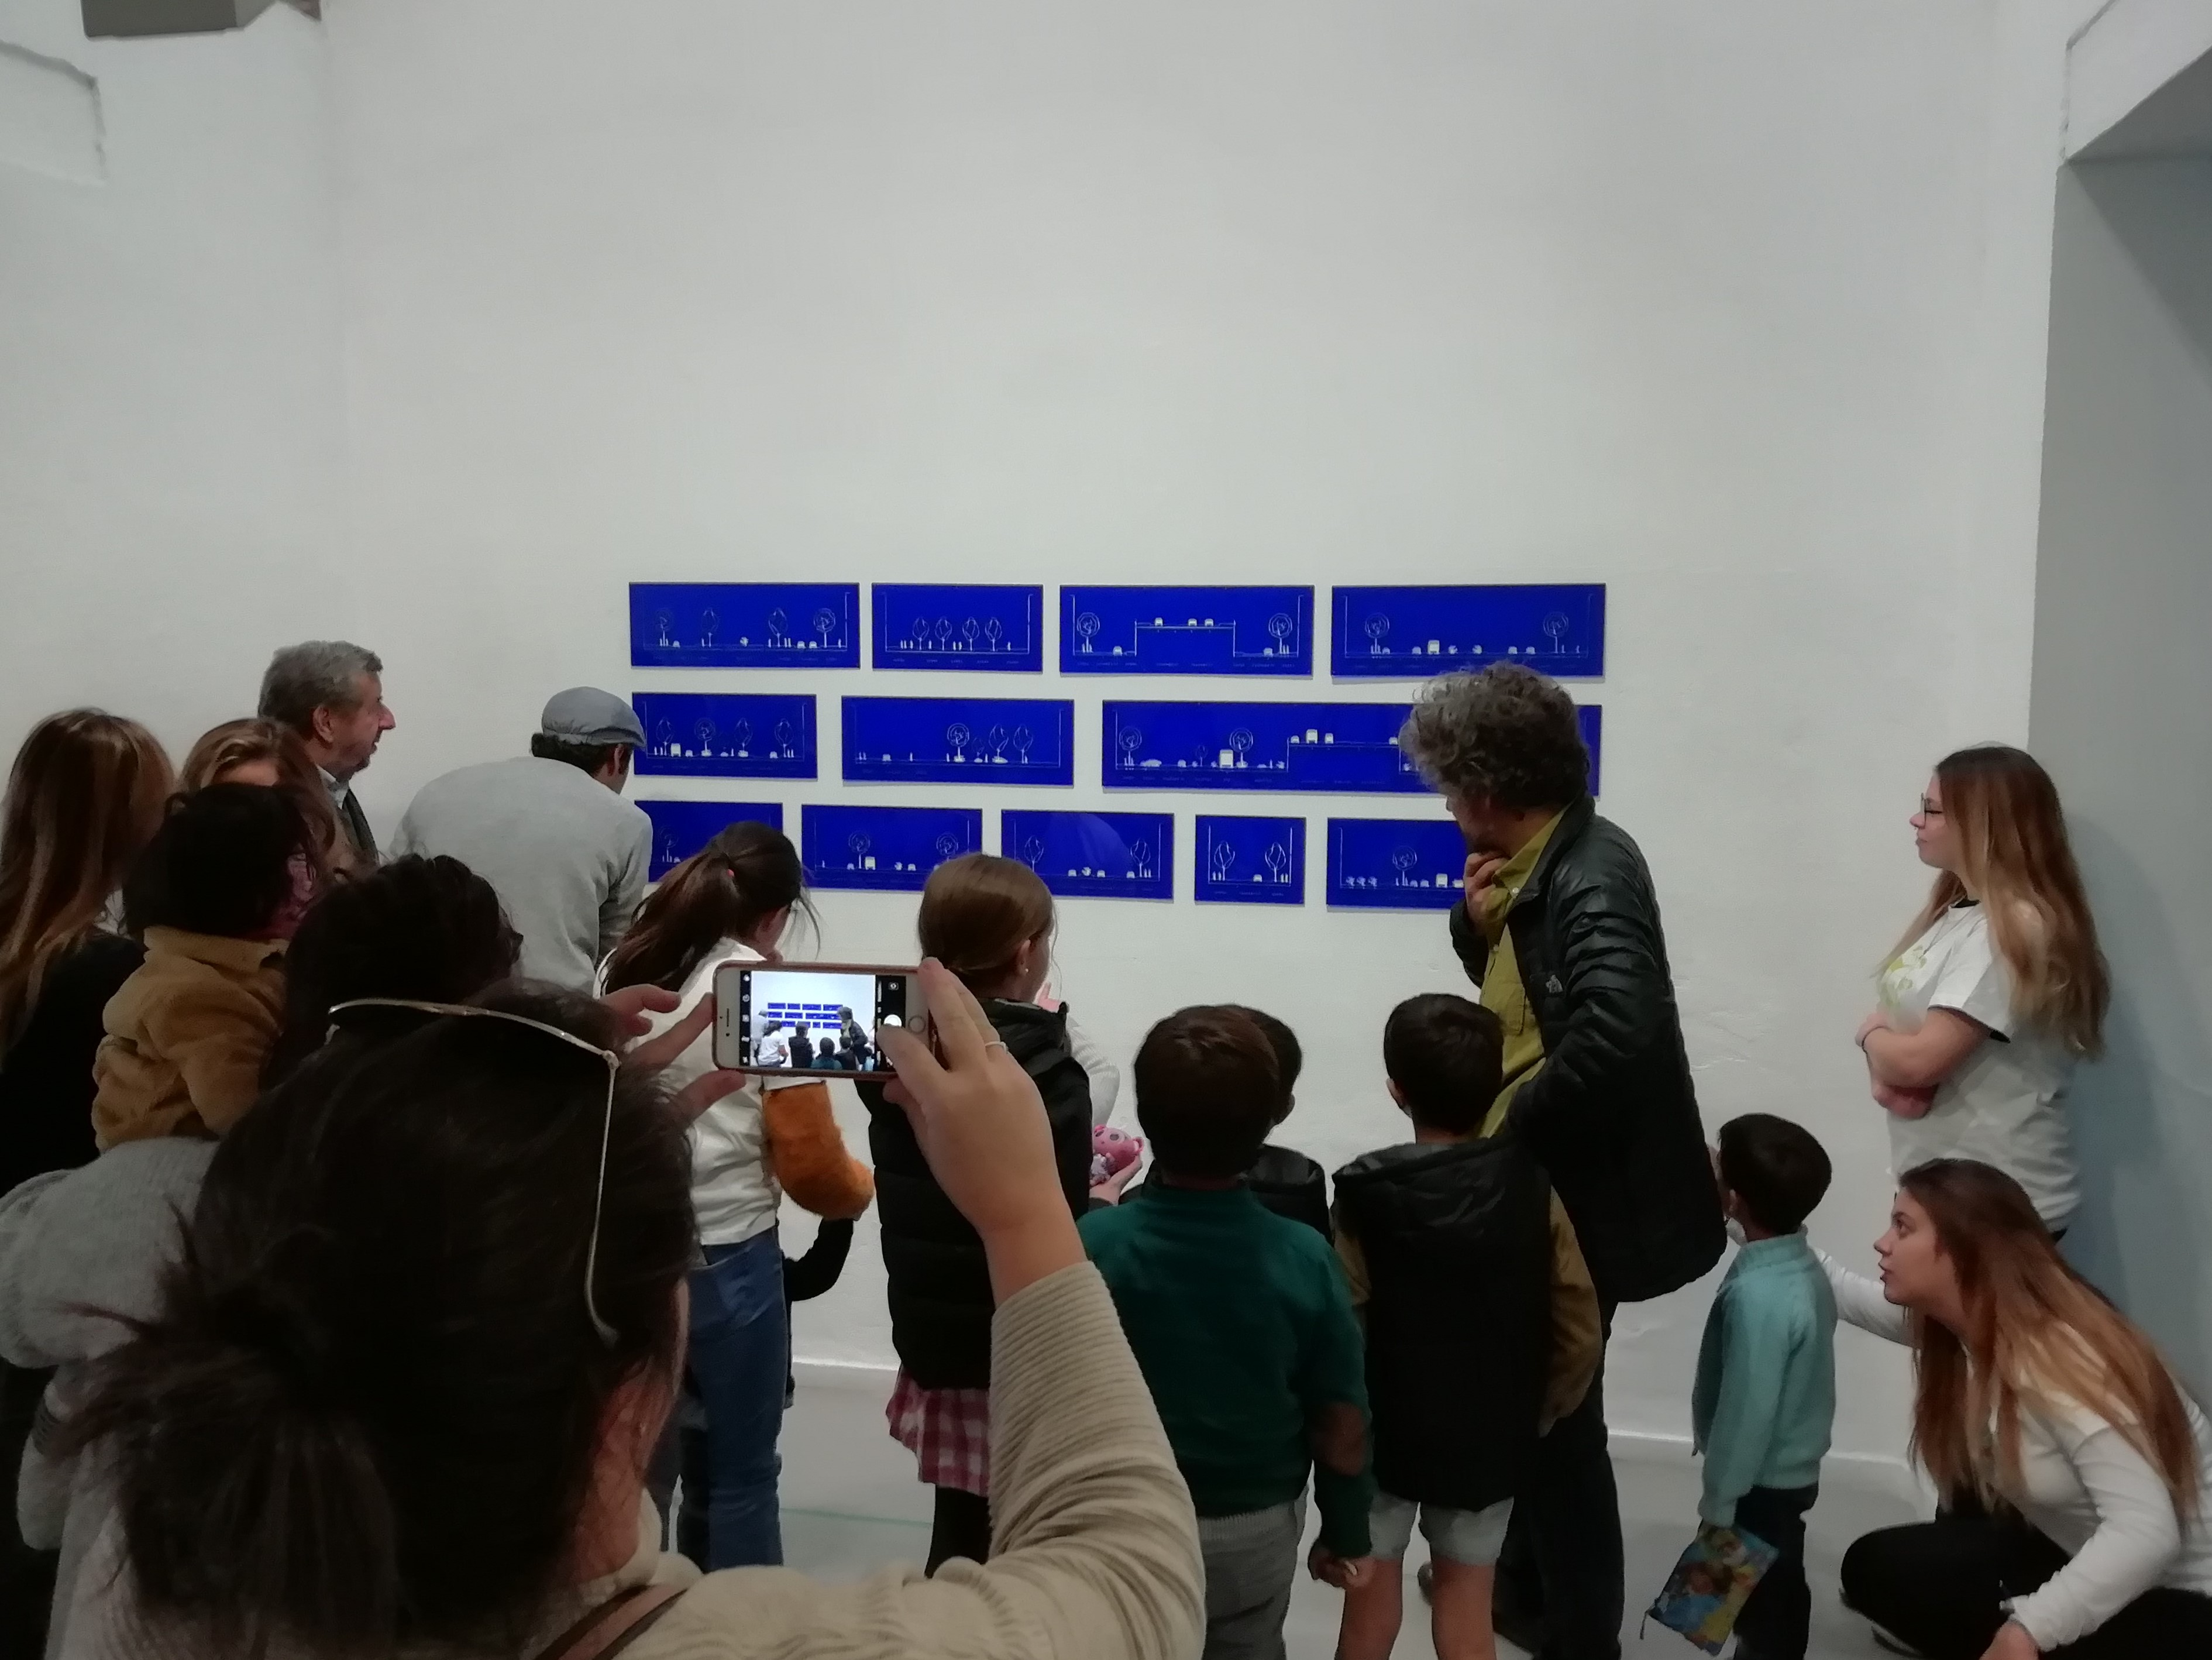 familias-niños-museo